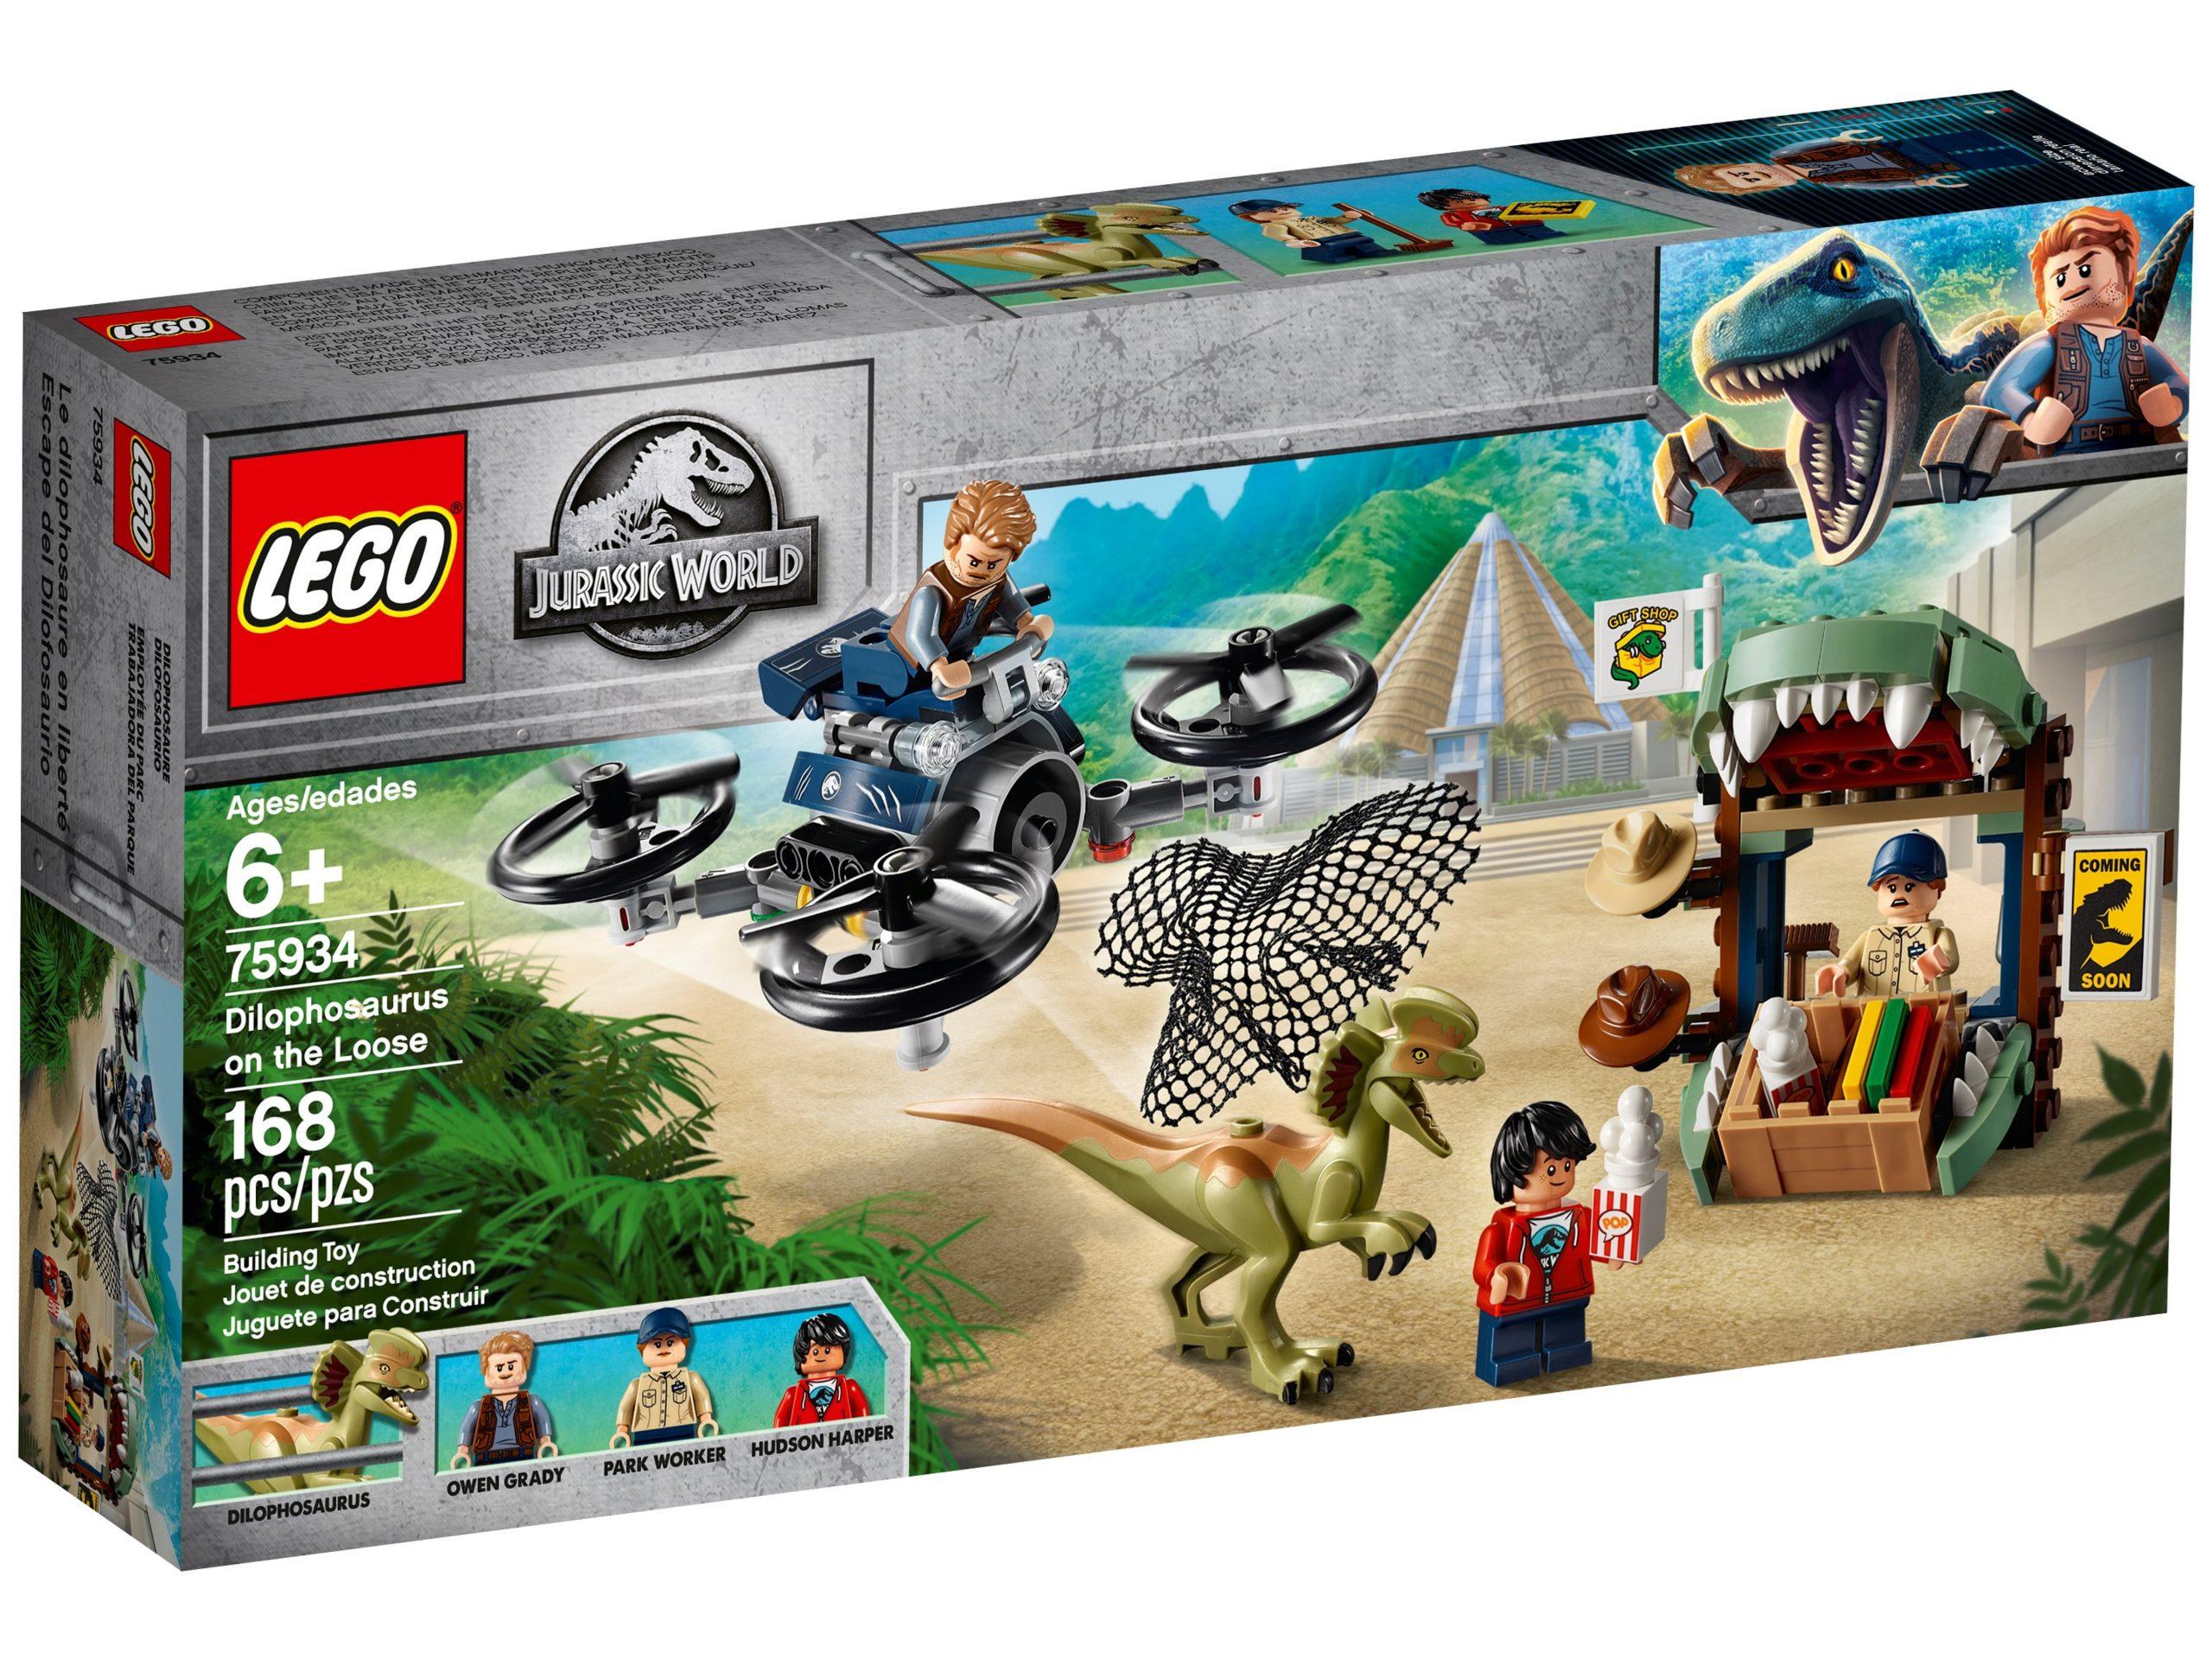 lego 75934 dilophosaurus on the loose scaled